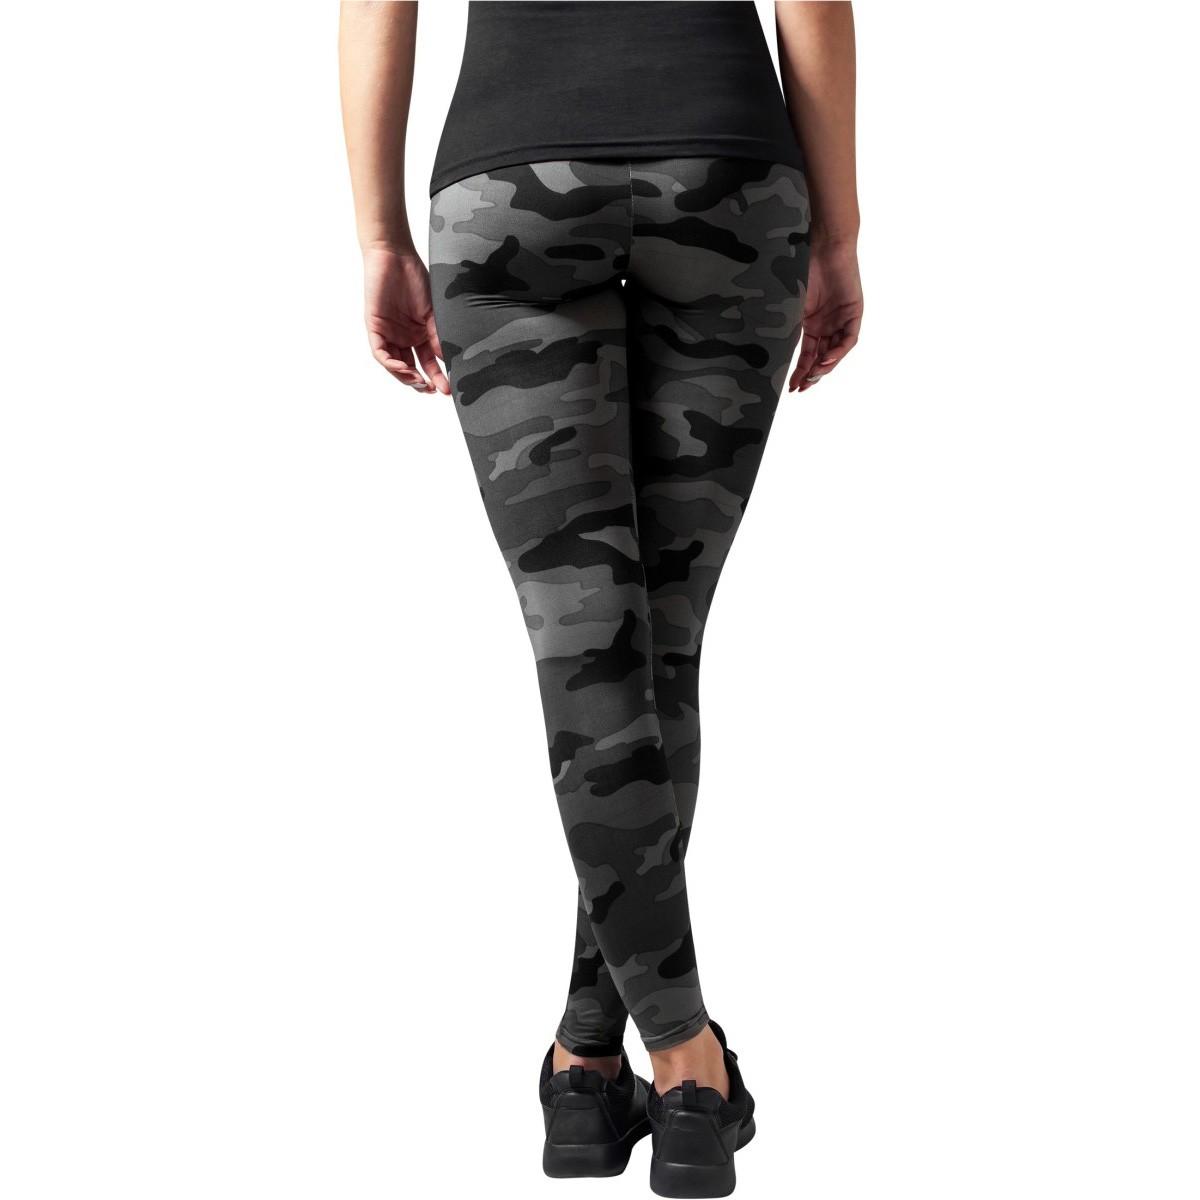 Army Urban Xl Stretch Tarn Leggings Camo Black Classics Ebay Ladies x6Zr6S